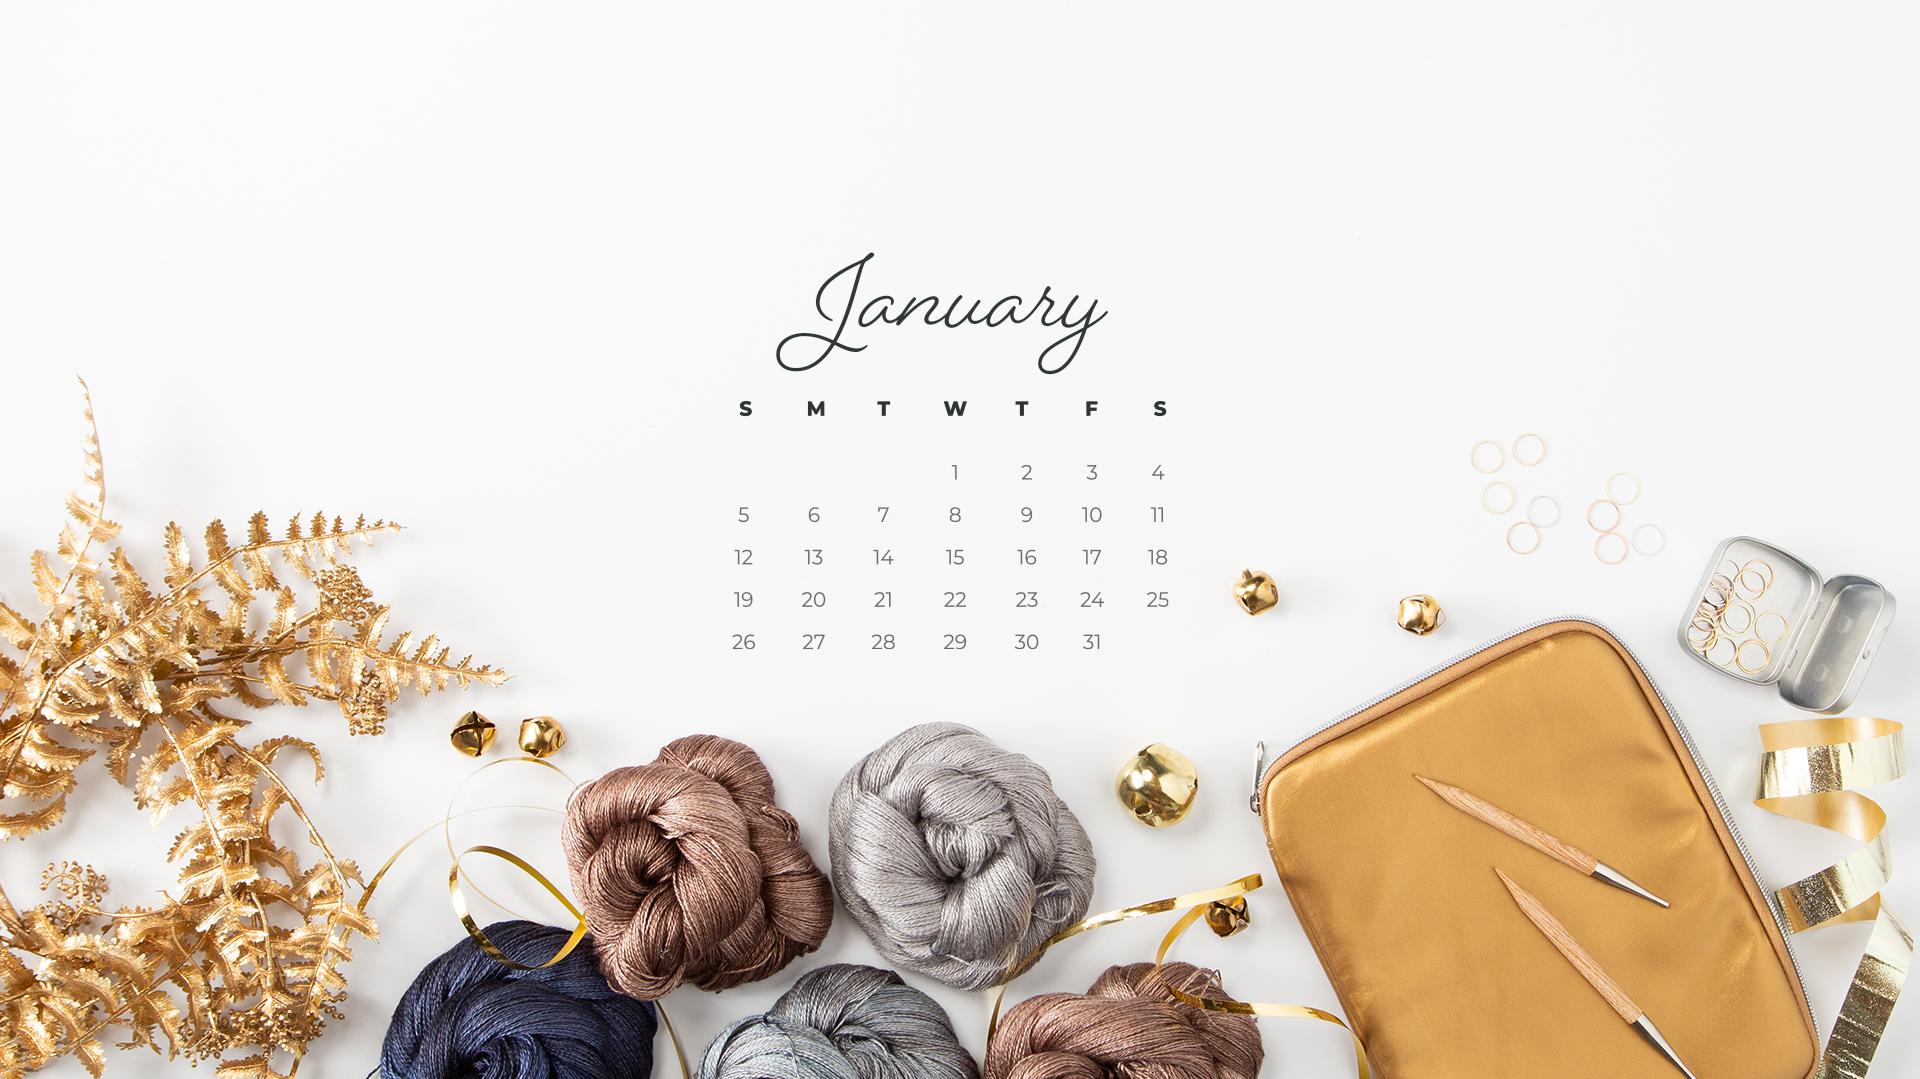 Downloadable January Calendar   KnitPicks Staff Knitting Blog 1920x1079